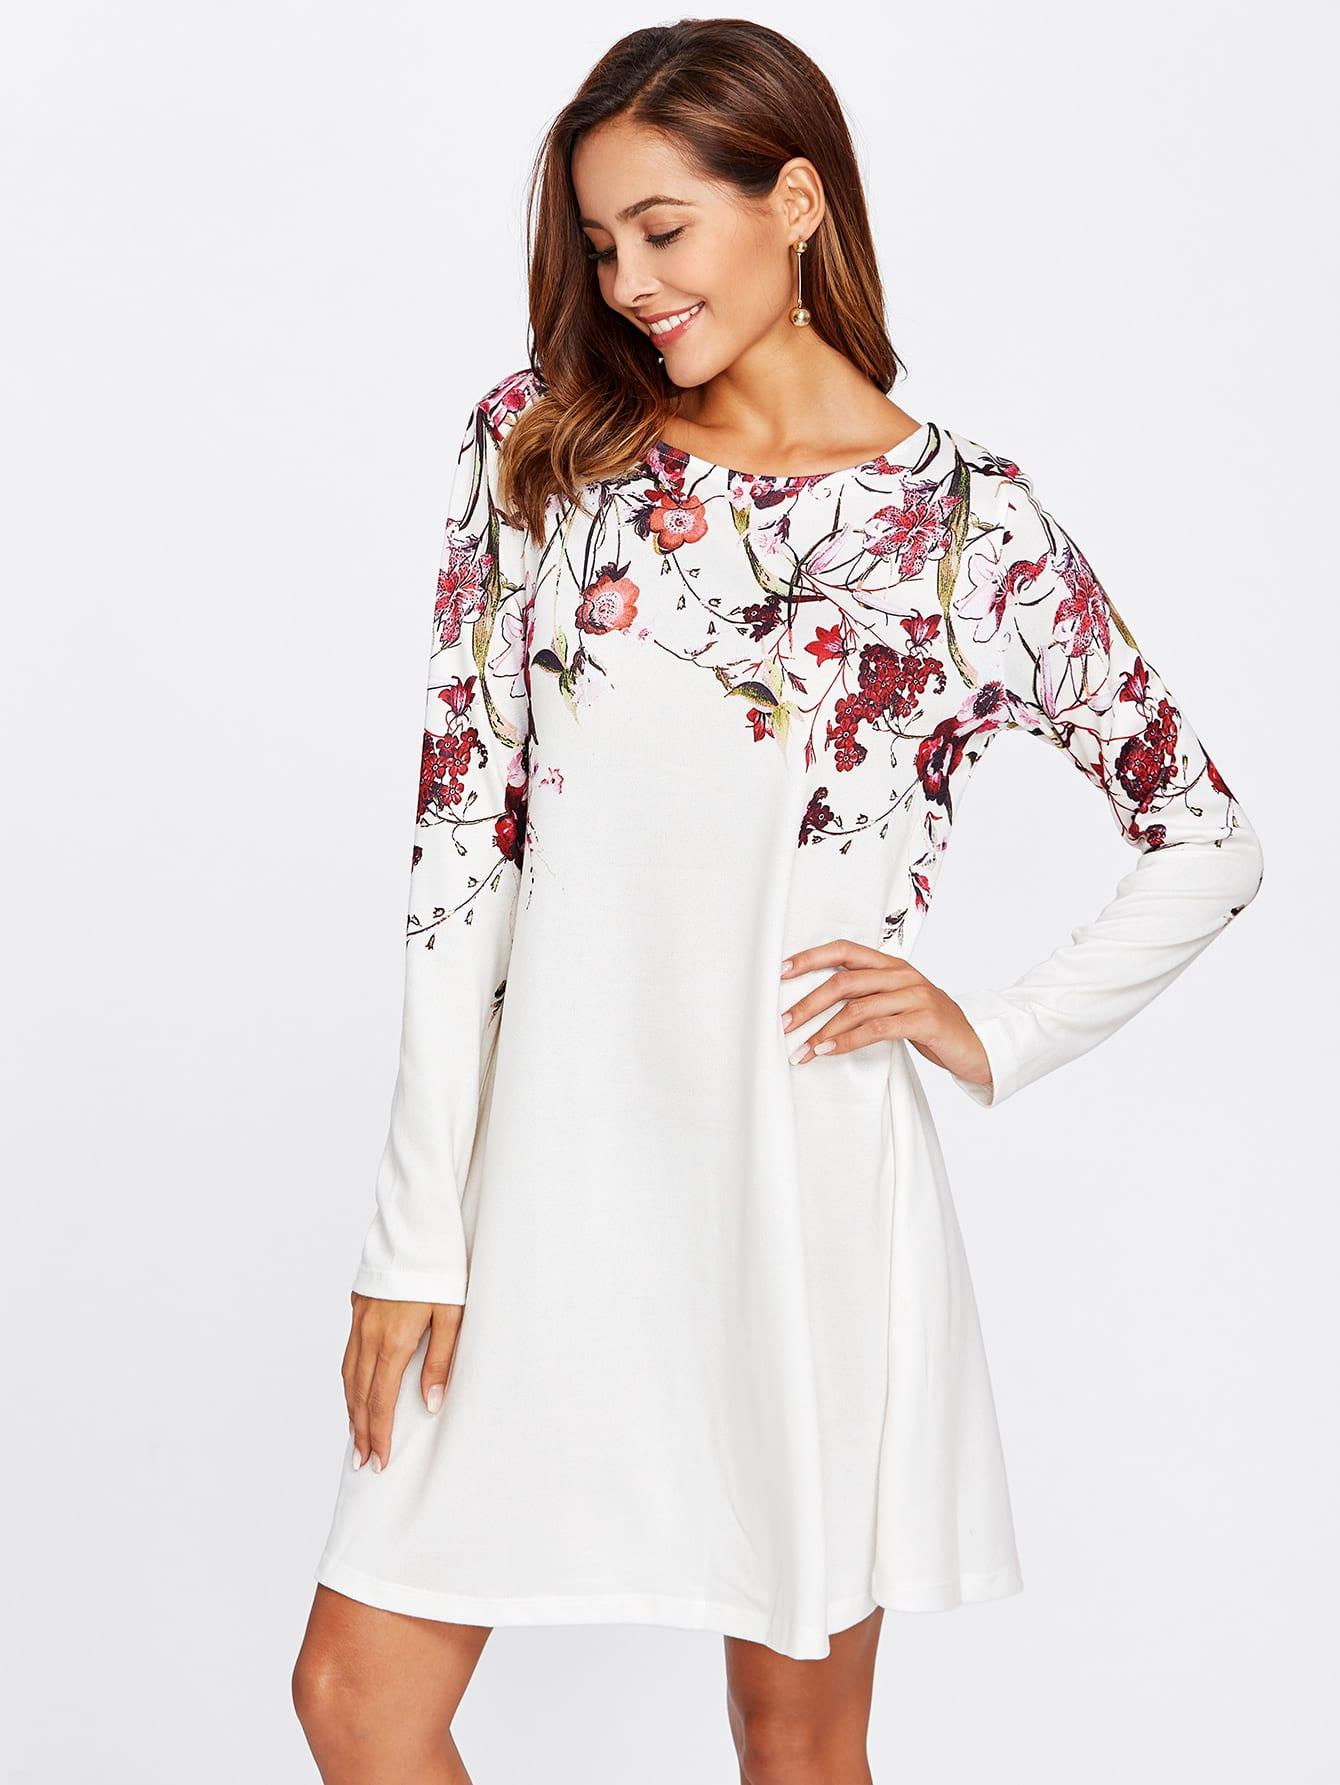 Botanical Print Flowy Dress scalloped edge botanical print dress